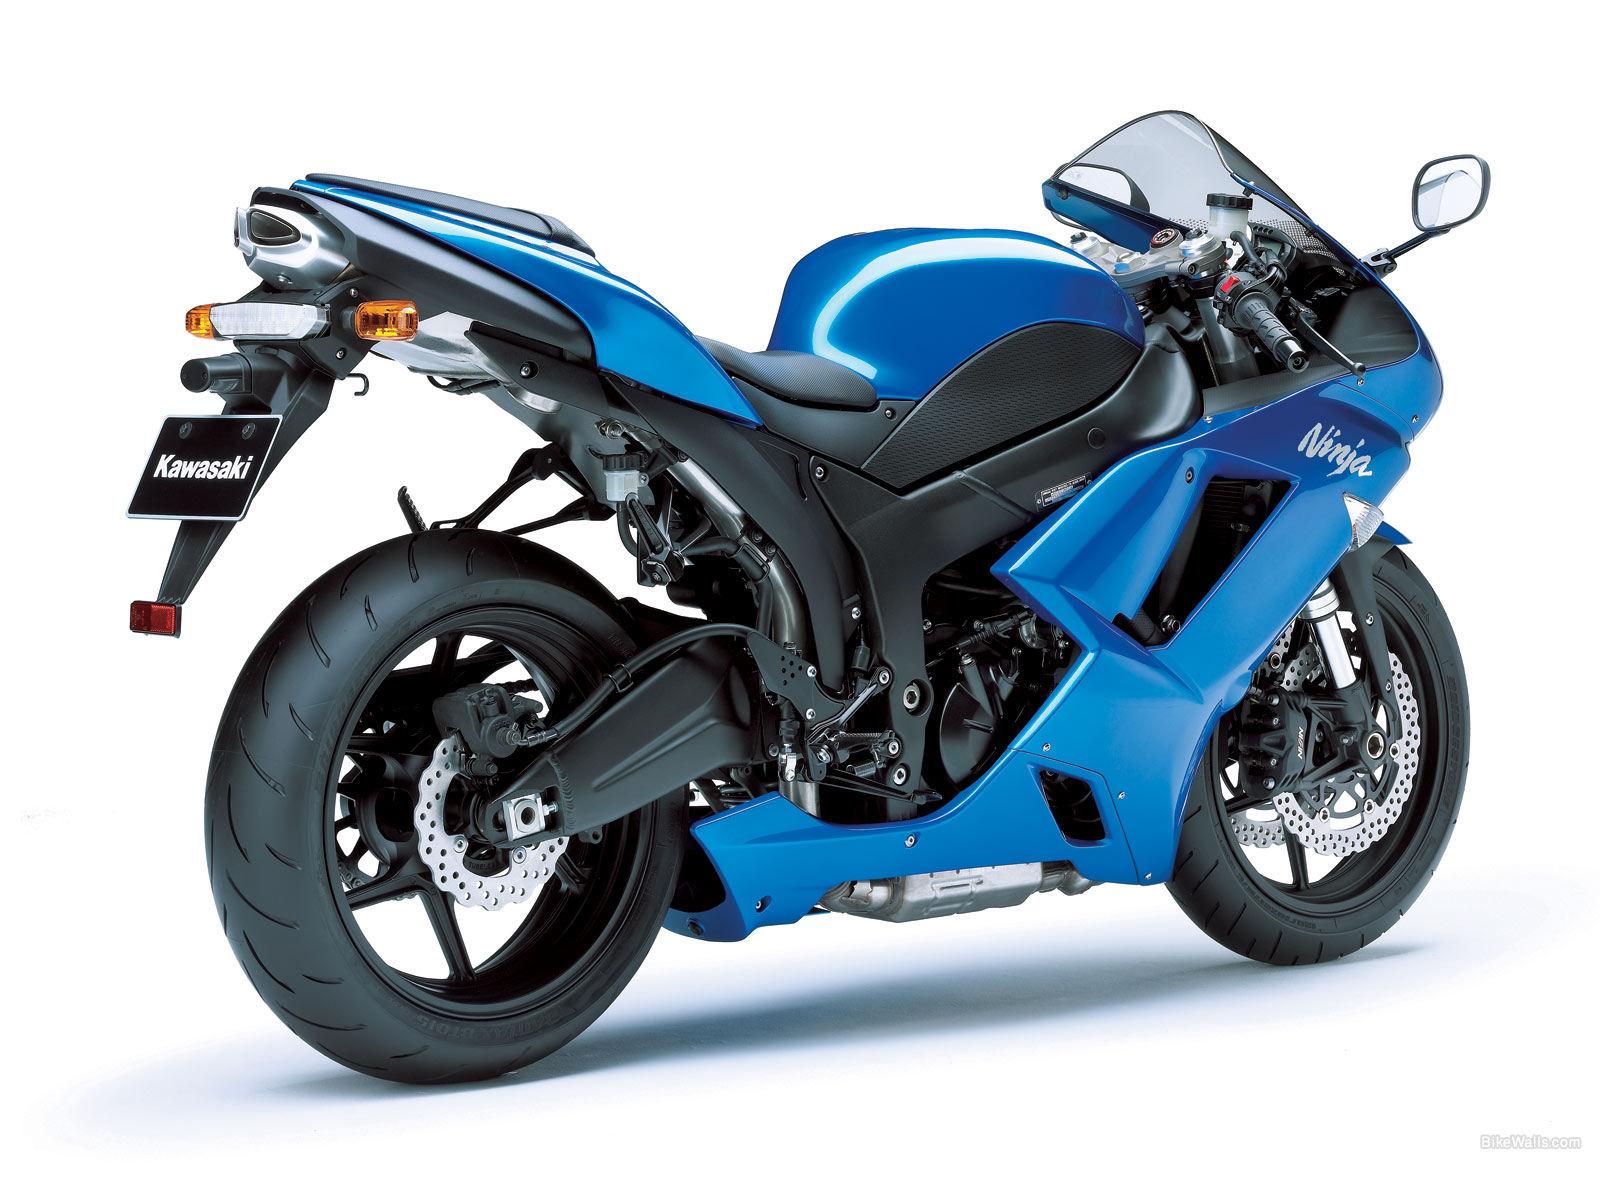 KAWASAKI NINJA ZX-6R blue